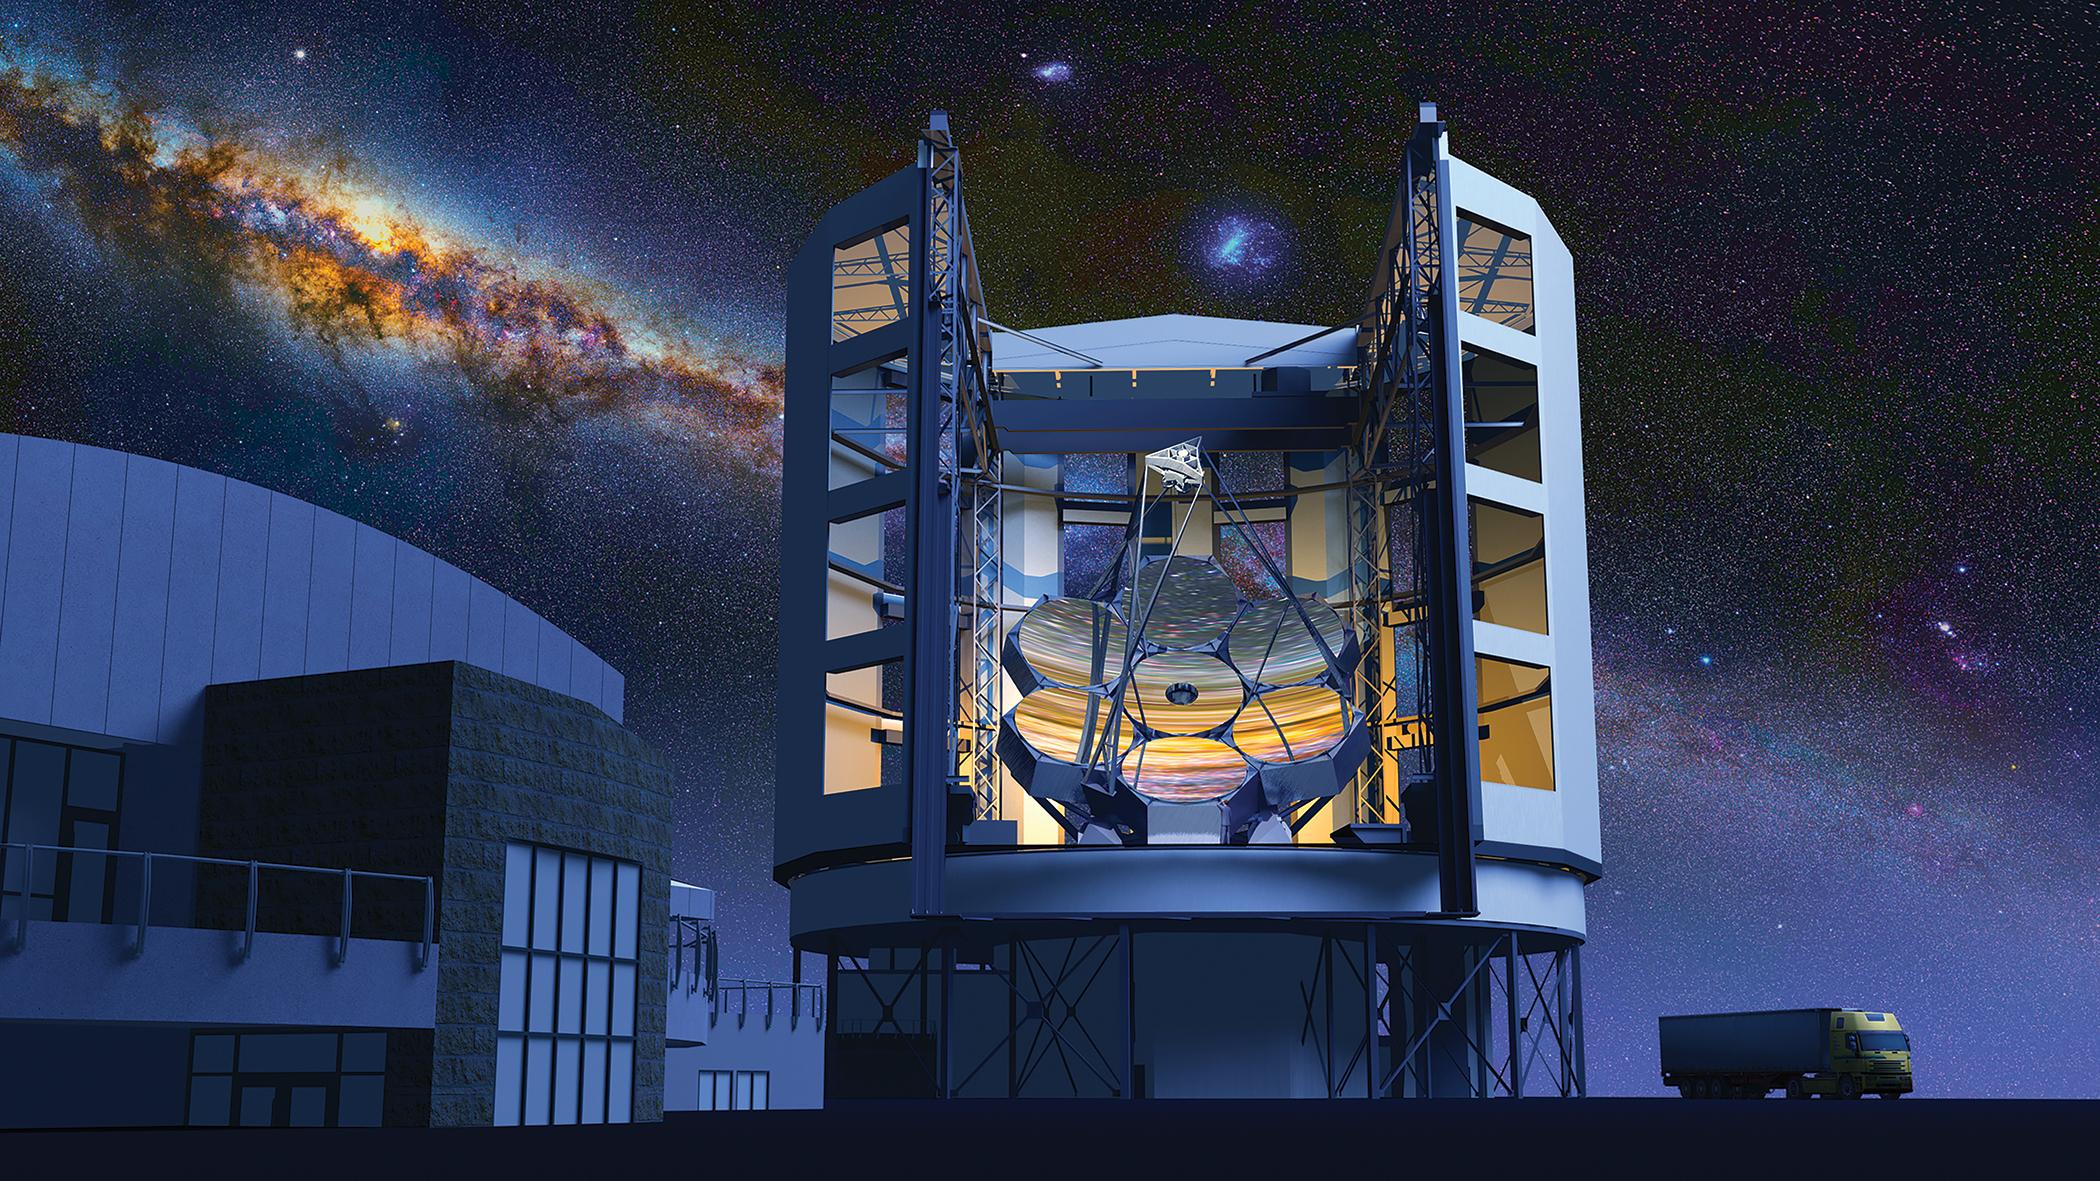 Credit: Giant Magellan Telescope—GMTO Corporation